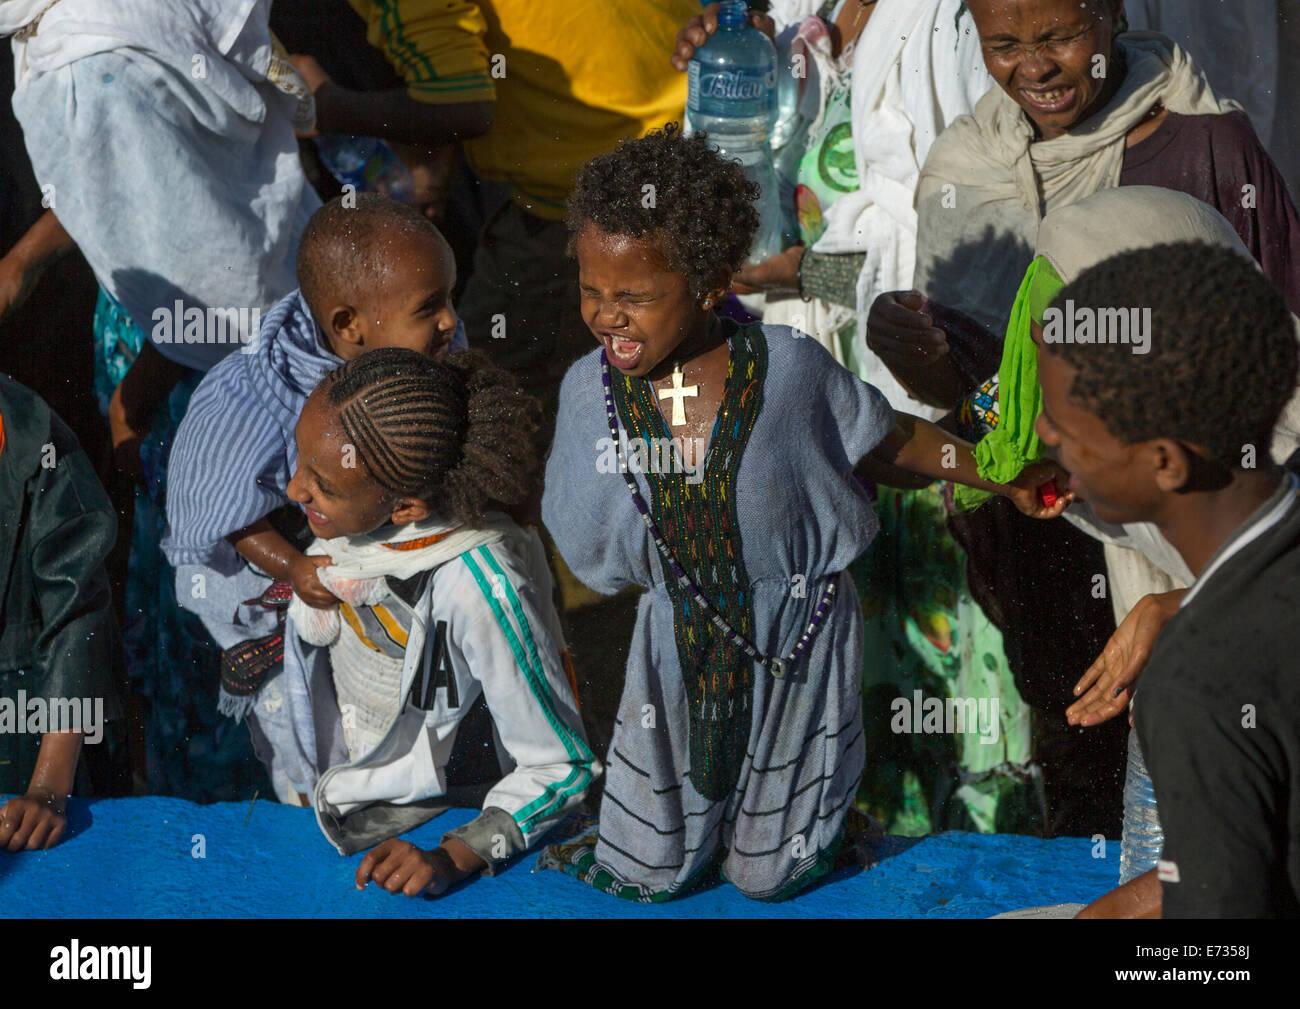 Holy Water Sprayed Onto The Crowd Attending Timkat Celebrations Of Epiphany, Lalibela, Ethiopia - Stock Image